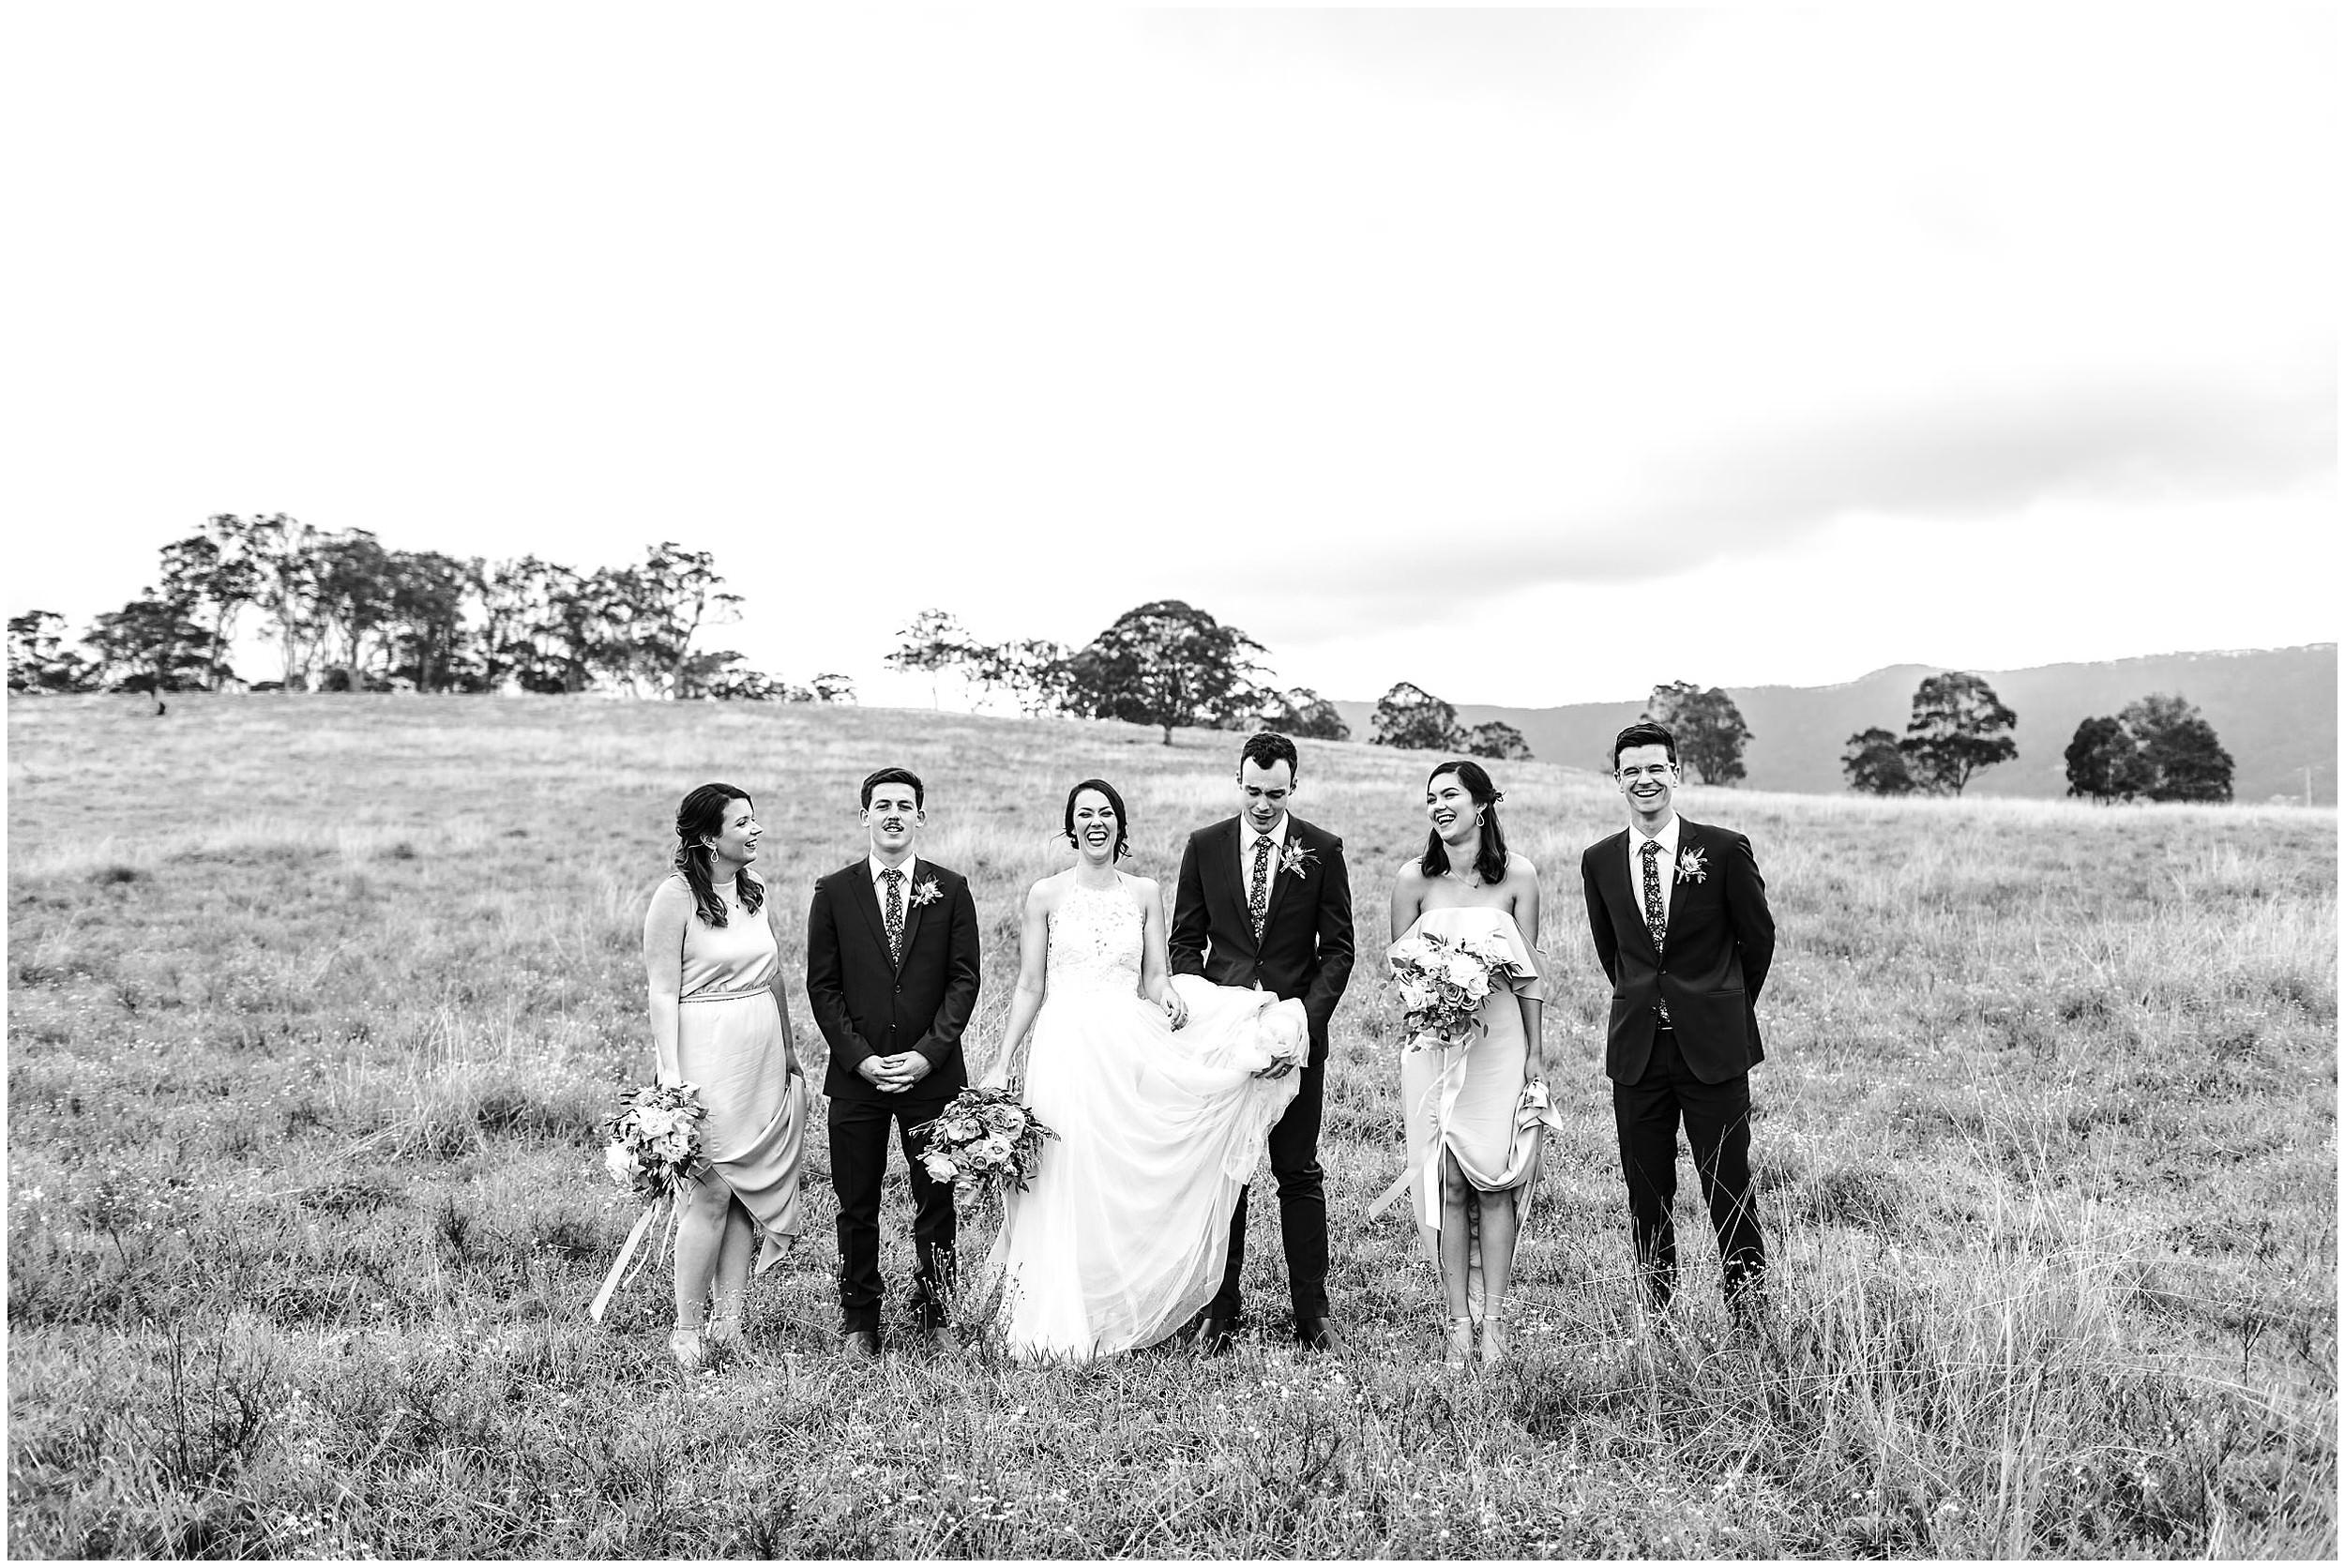 wedding_the_woolshed_steph_zac_0053.jpg